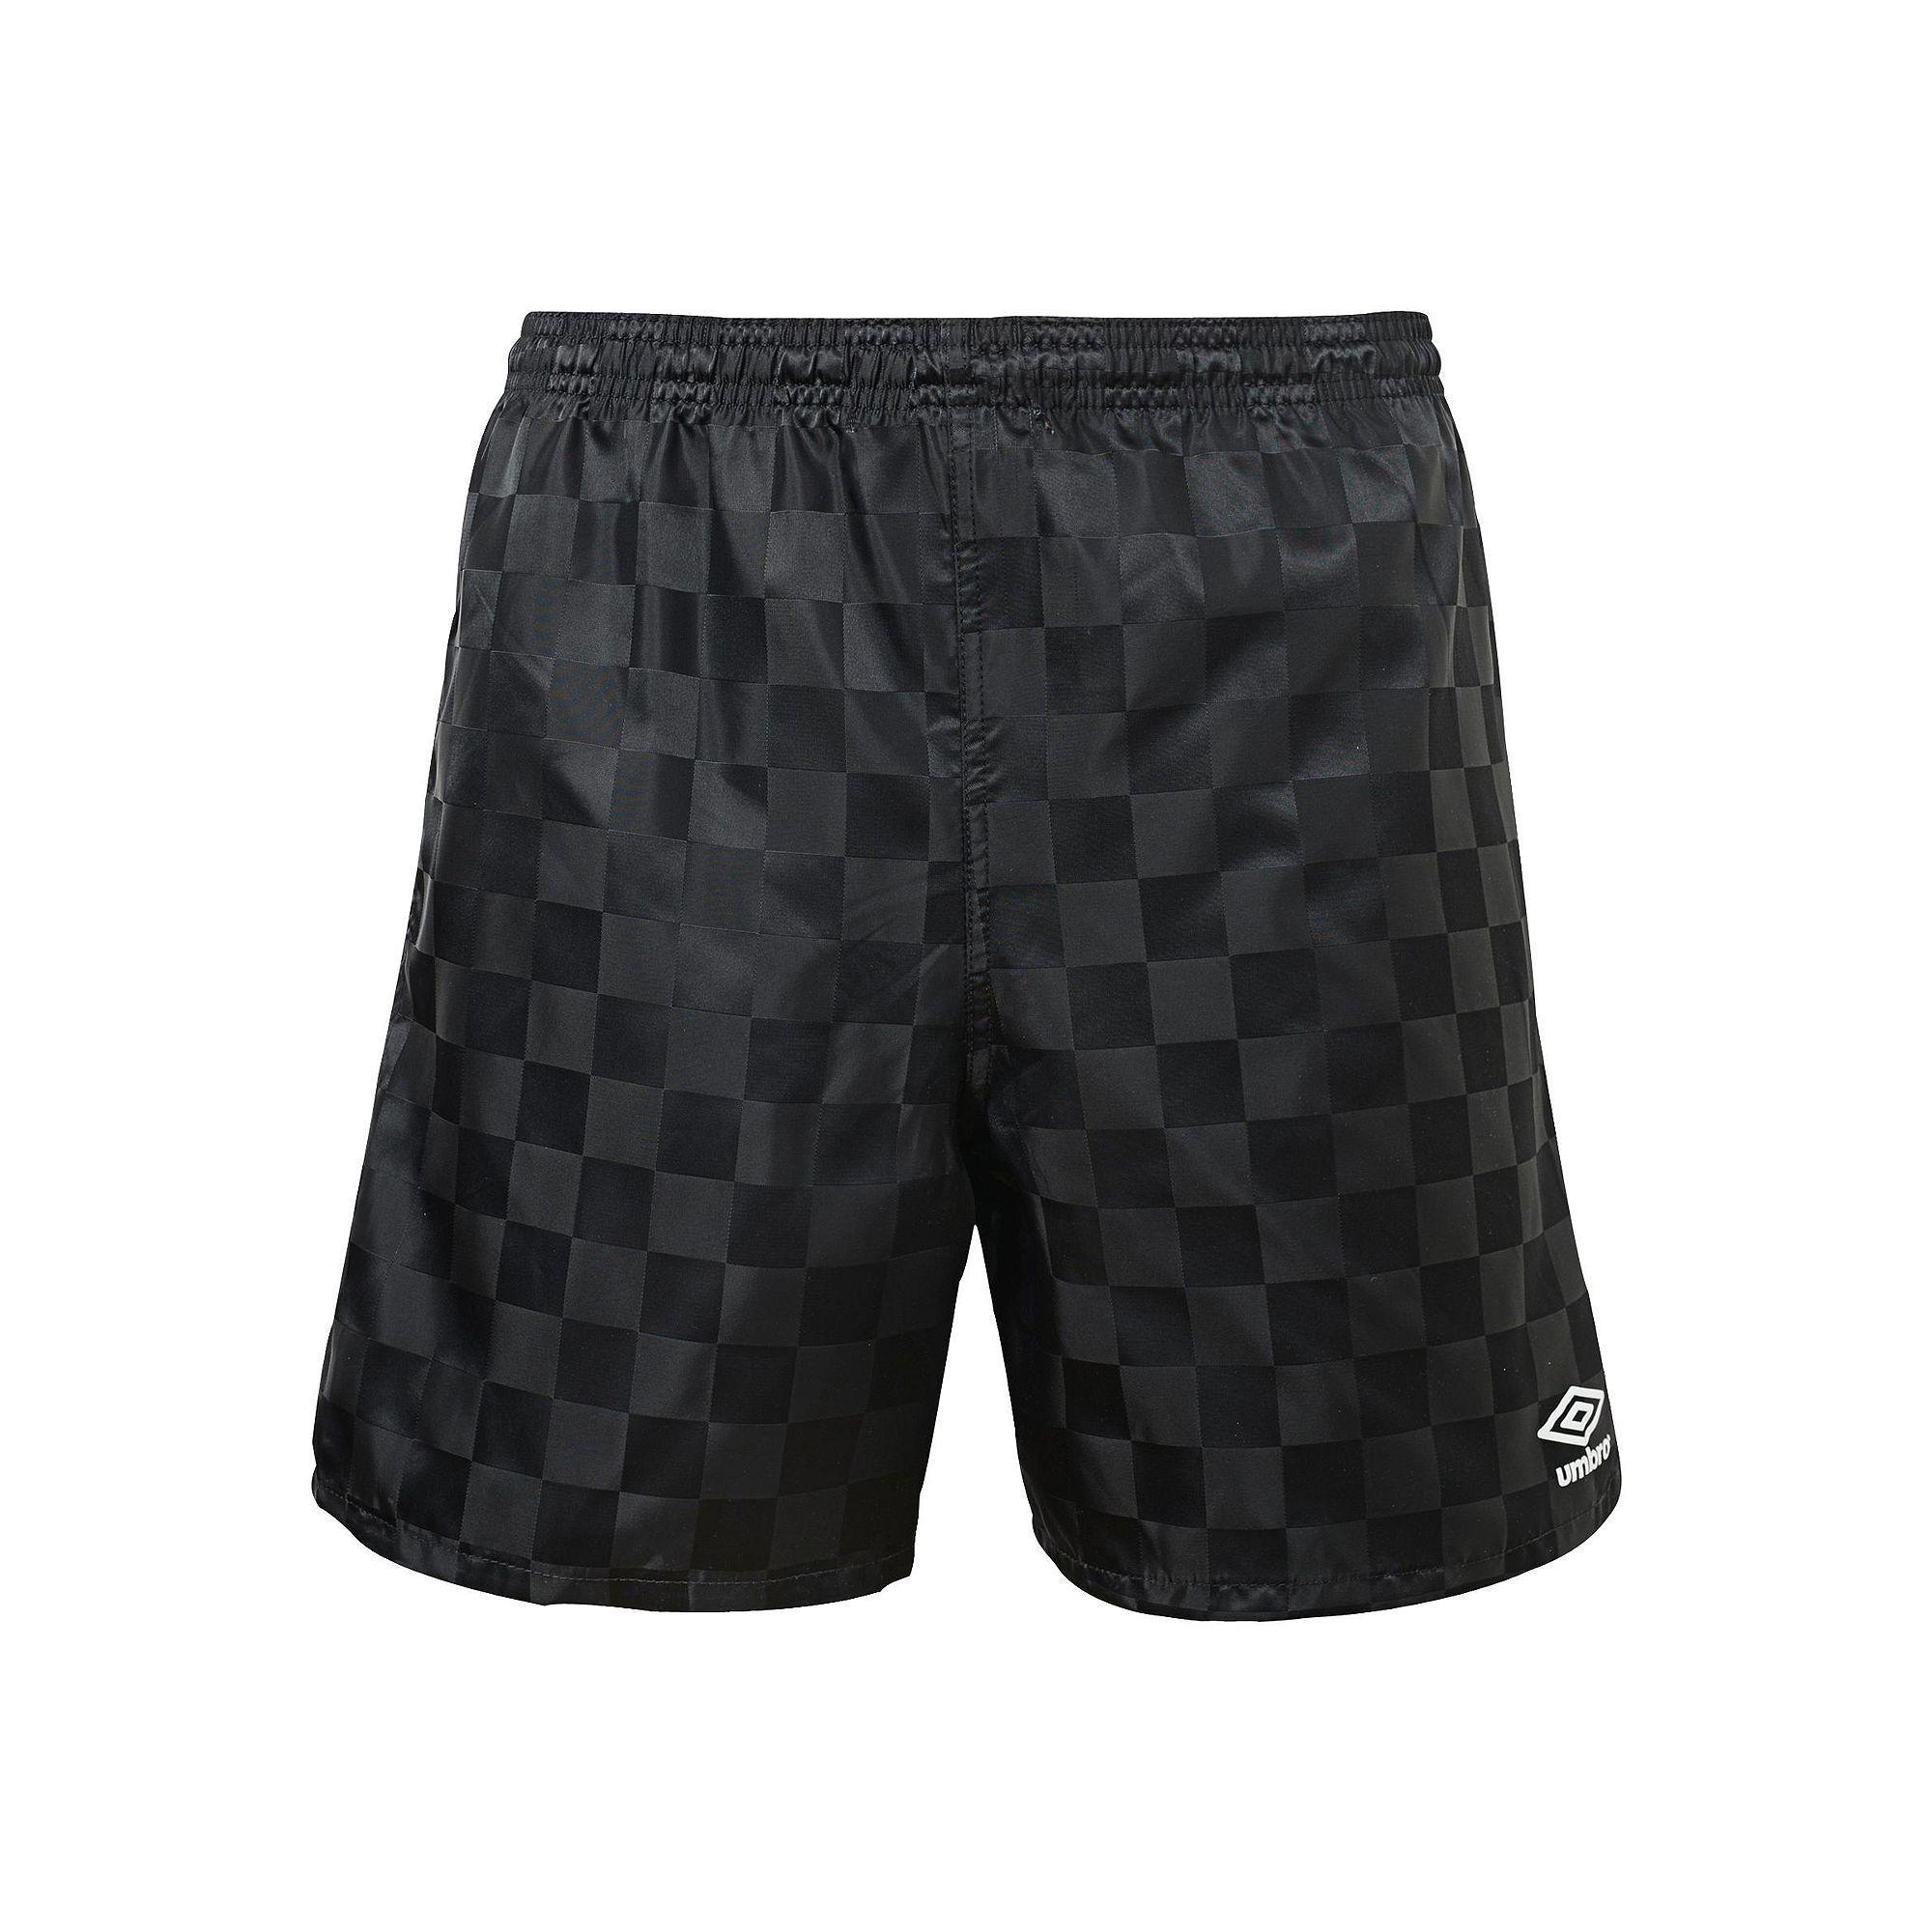 2503bf4d561 Men's Umbro Checkerboard Shorts | Products | Shorts, Jogger shorts, Men